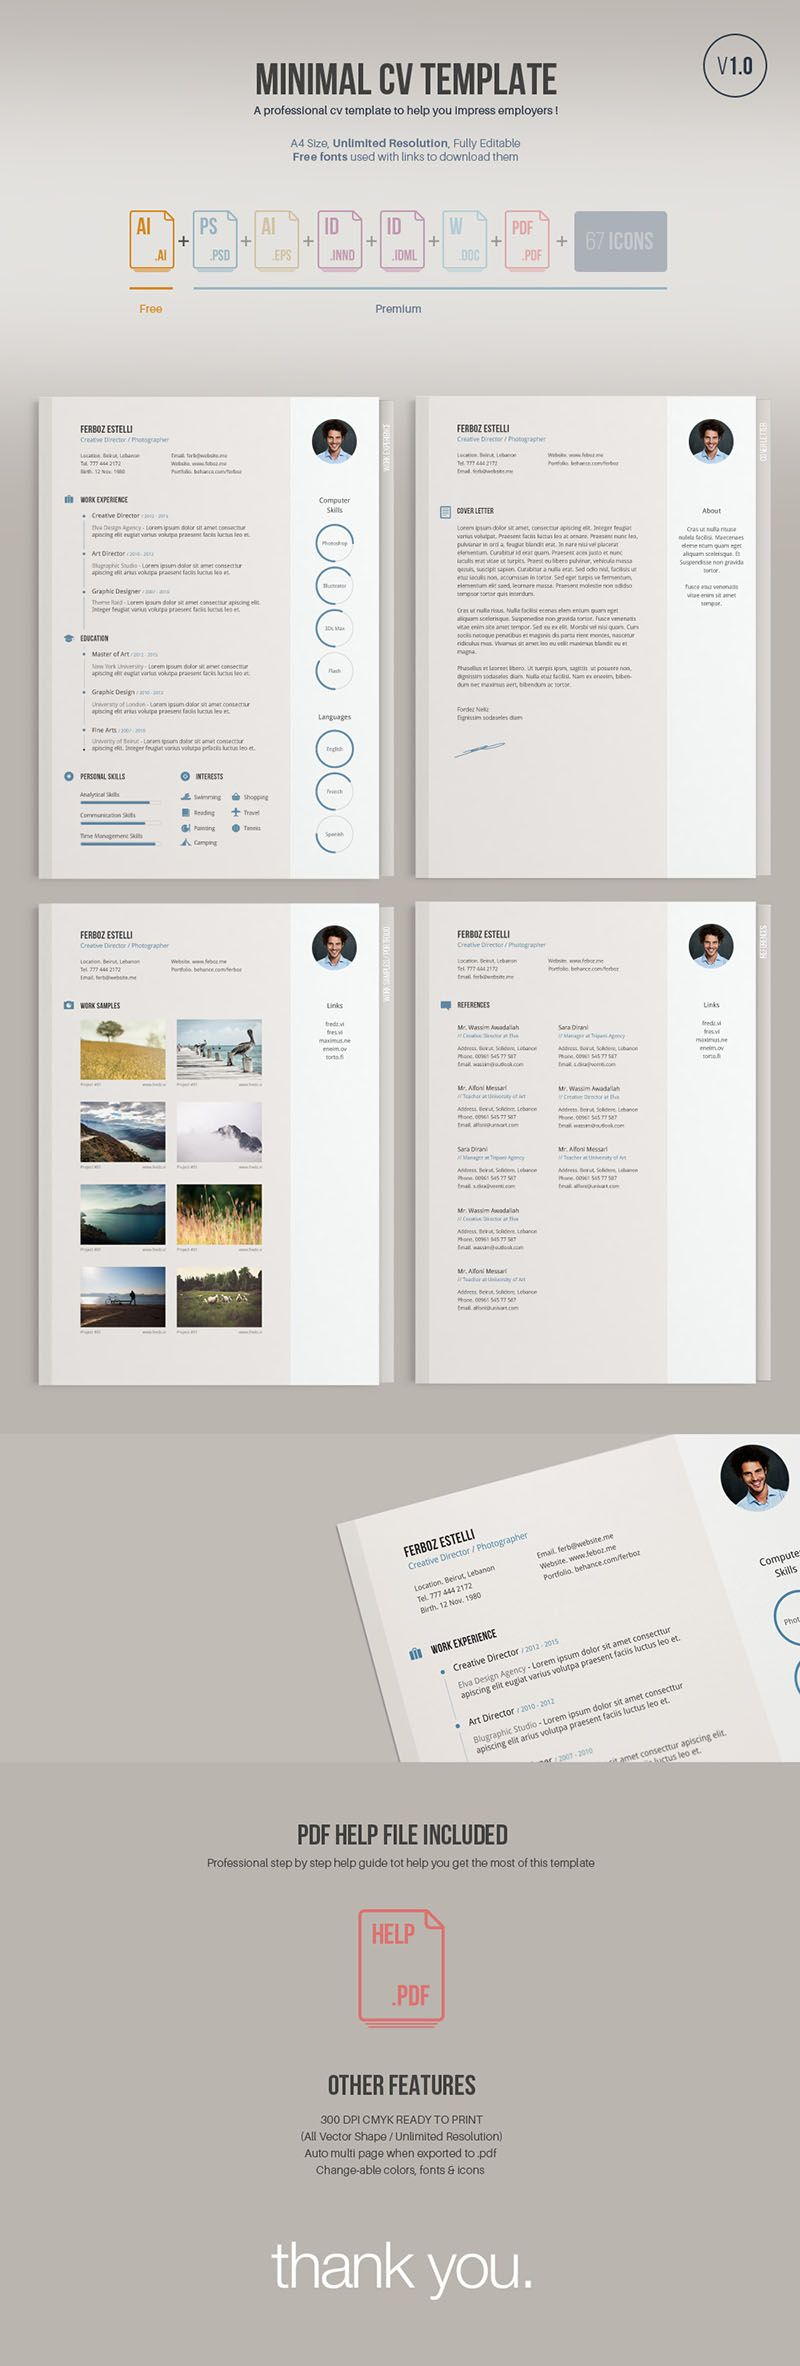 Ressource webdesign art digital gratuite   Job Hunt   Pinterest ...